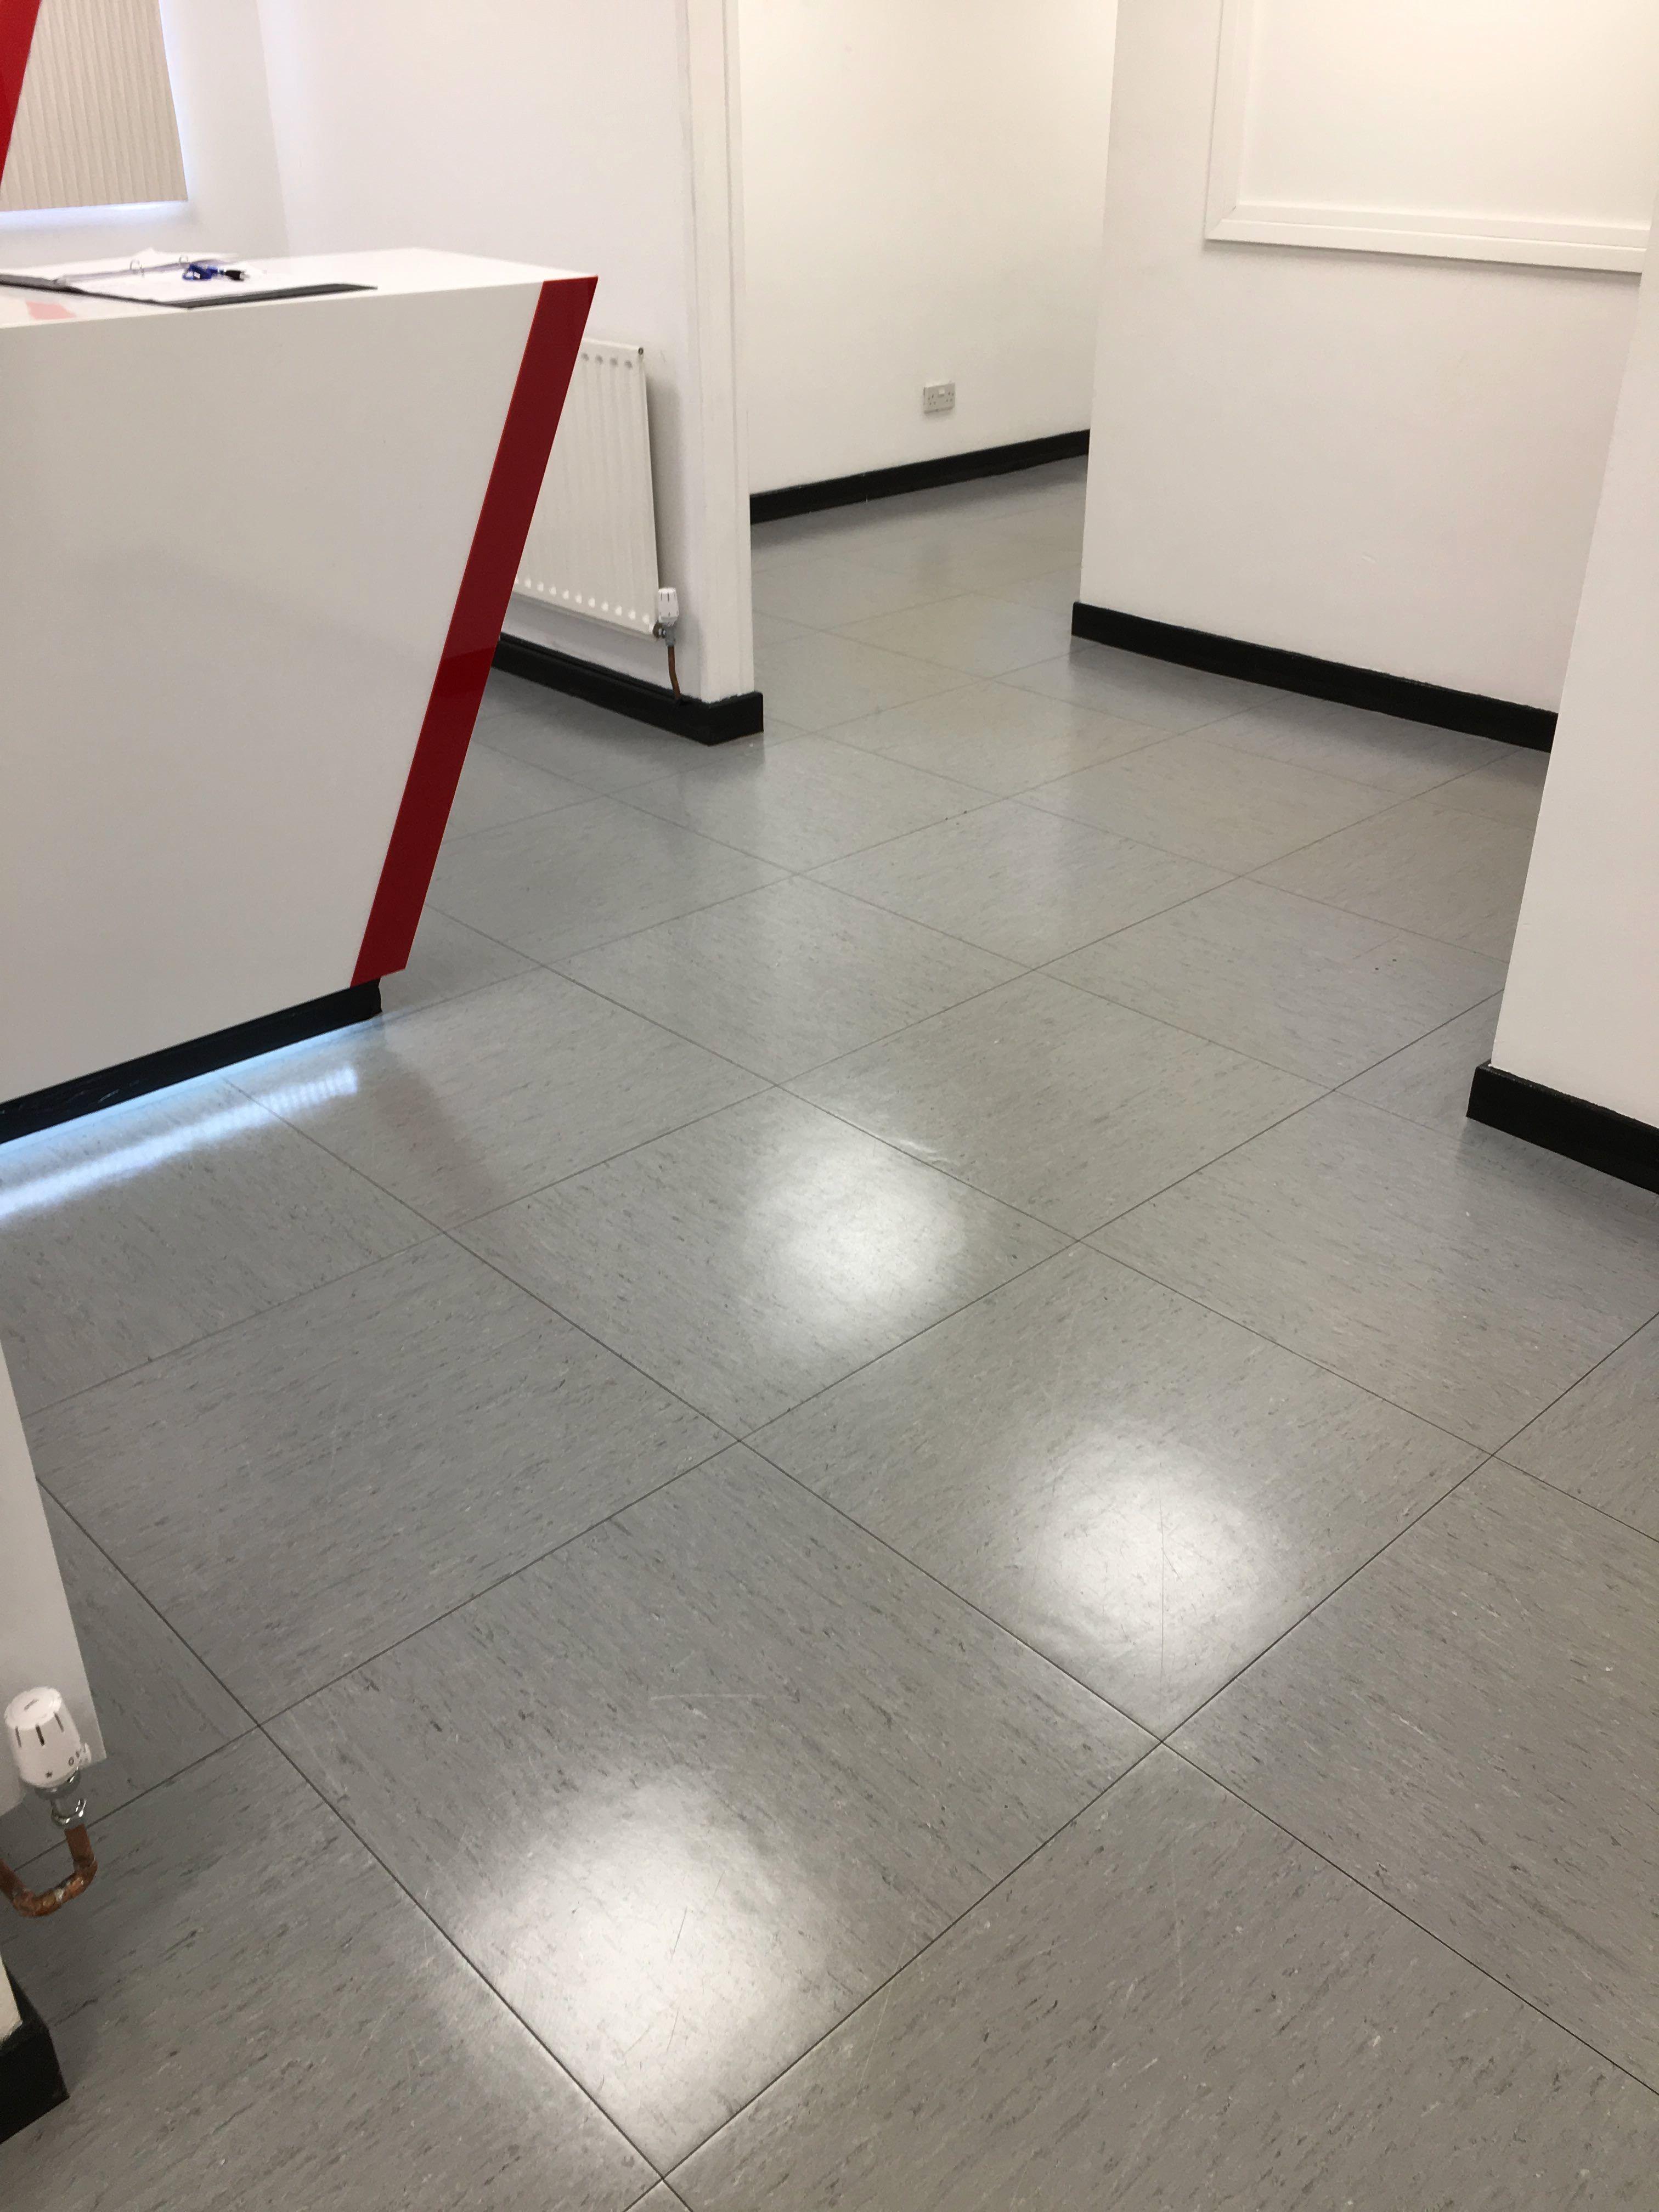 Vinyl floor reception area stripping and sealing surrey vinyl vinyl floor reception area stripping and sealing surrey dailygadgetfo Images